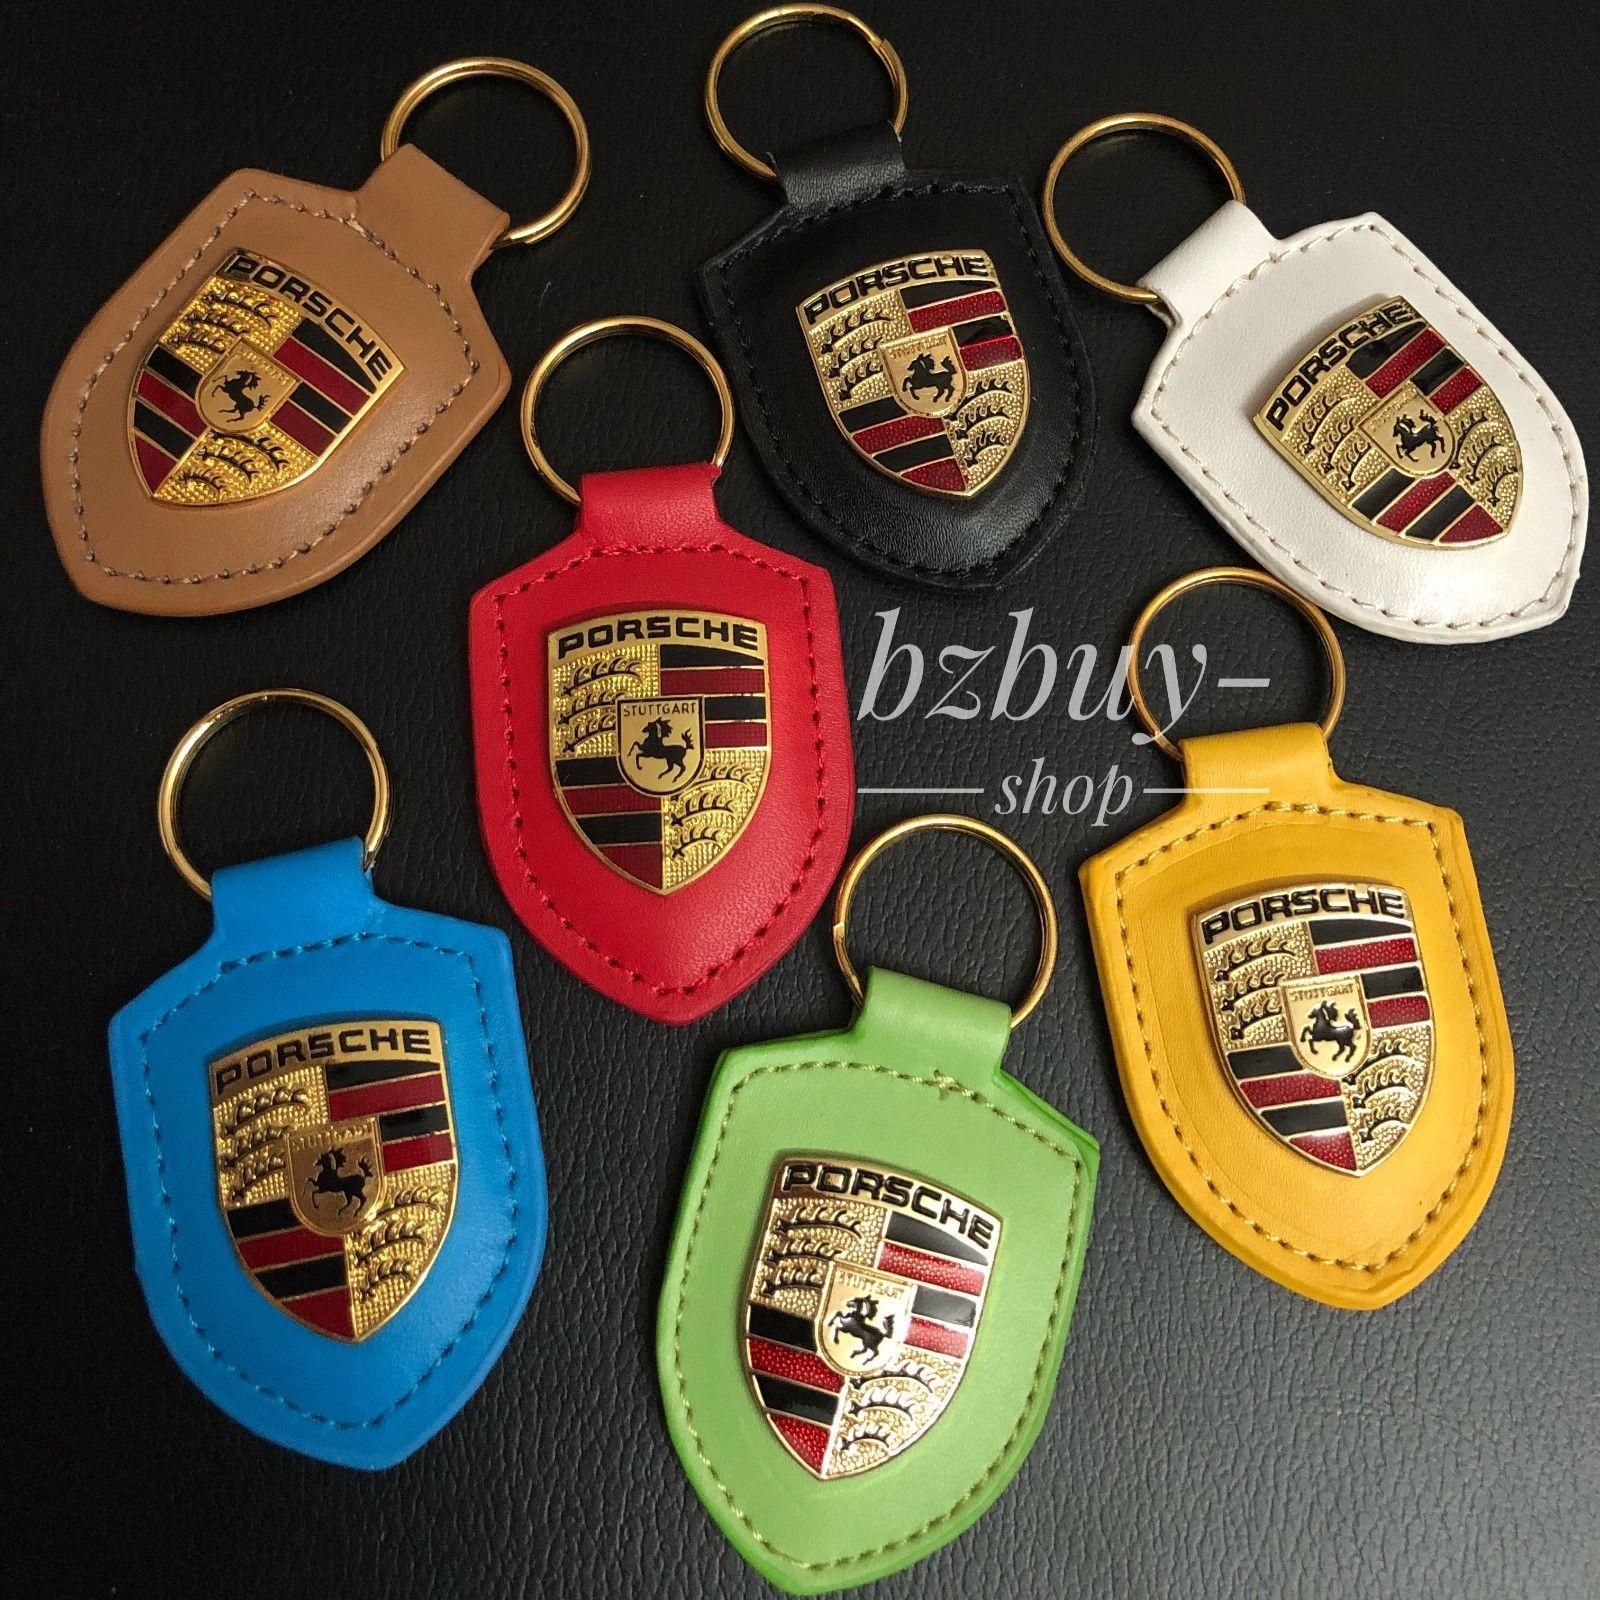 Porsche Genuine Leather Key Chain Crest new all Colors WAP05009